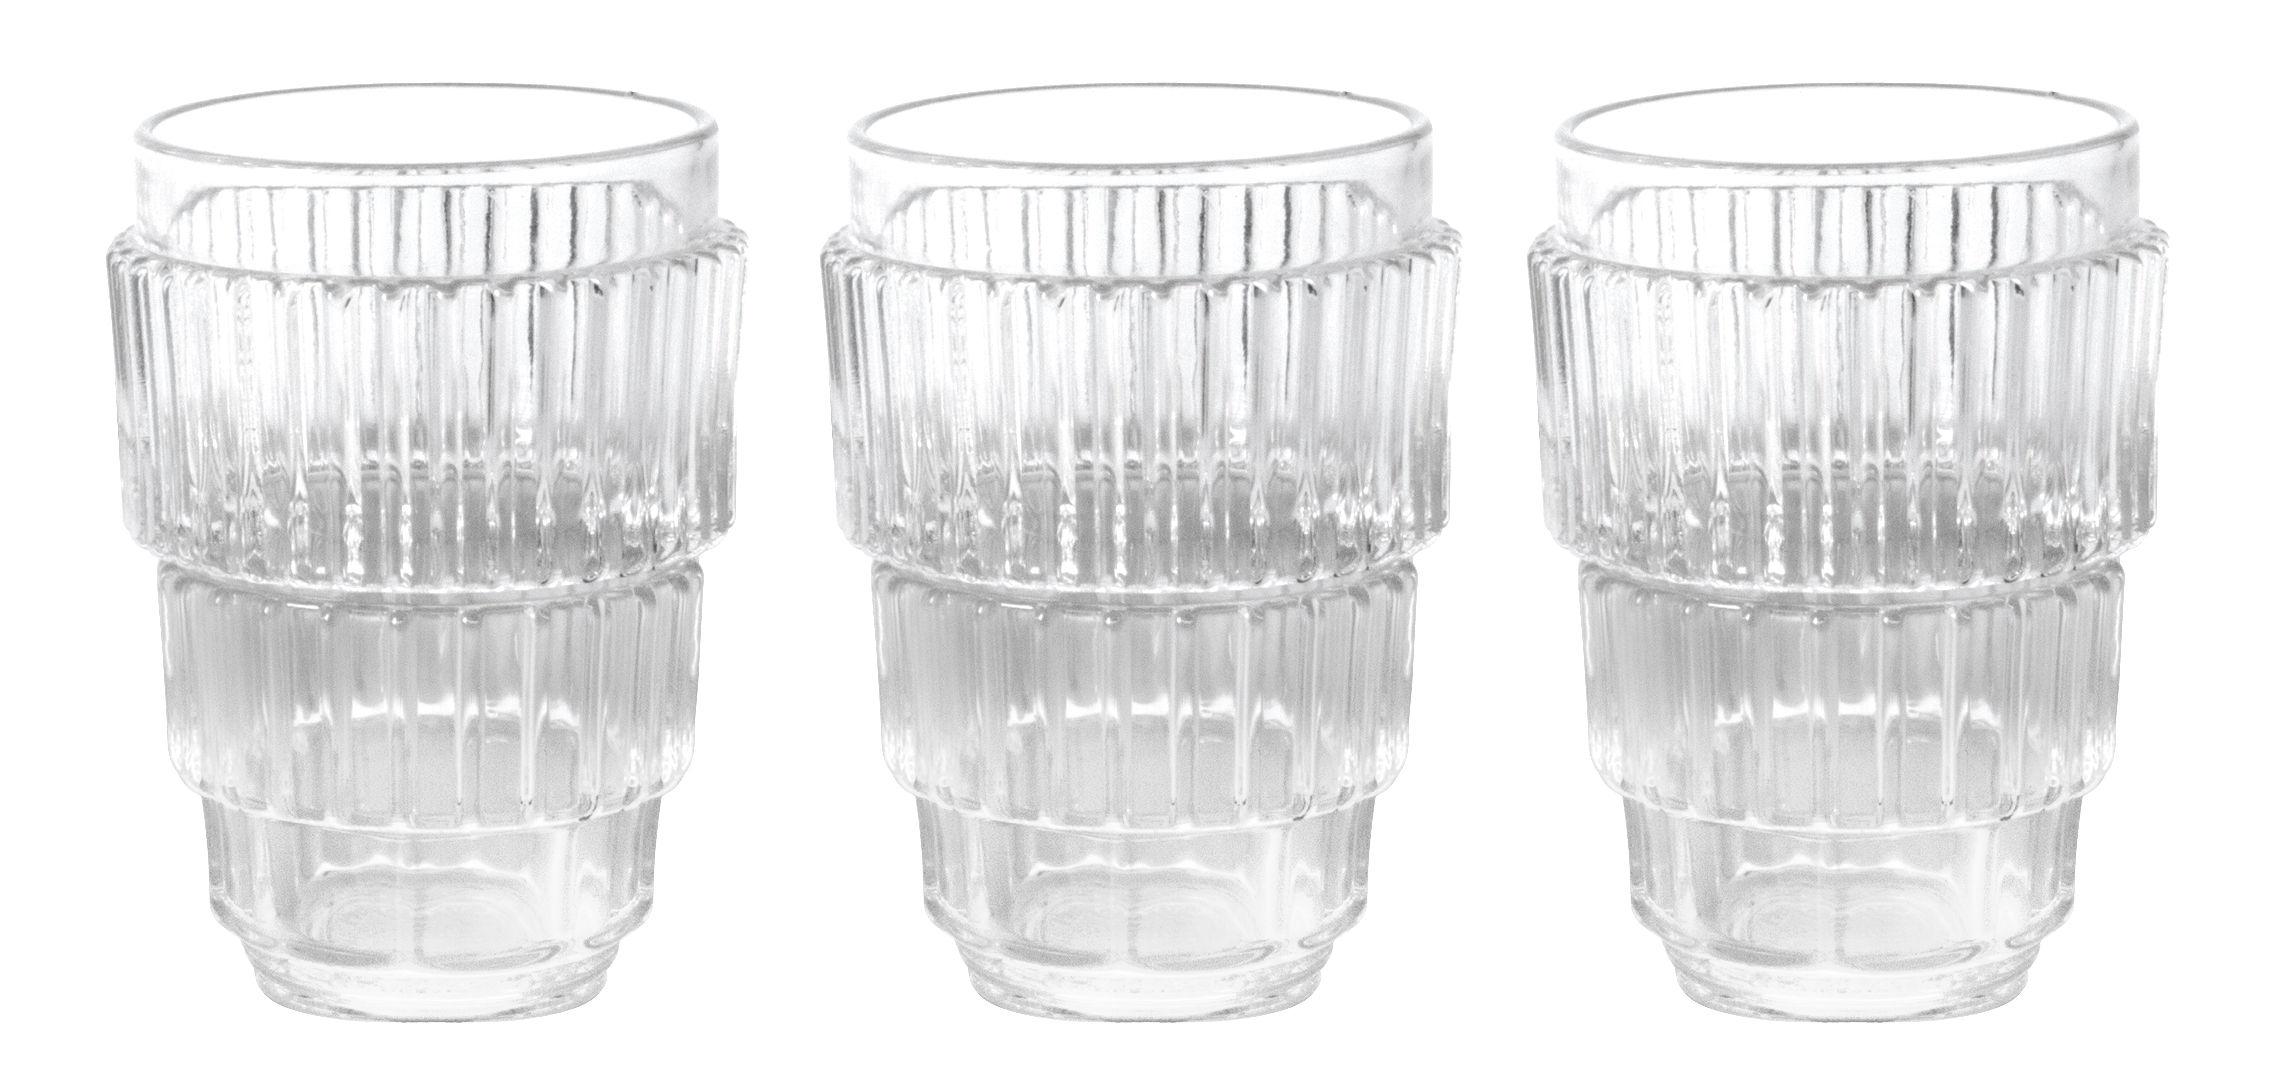 Tischkultur - Gläser - Machine Collection Glas / H 13 cm - 3er Set - Diesel living with Seletti - H 13 cm / Transparent - Glas